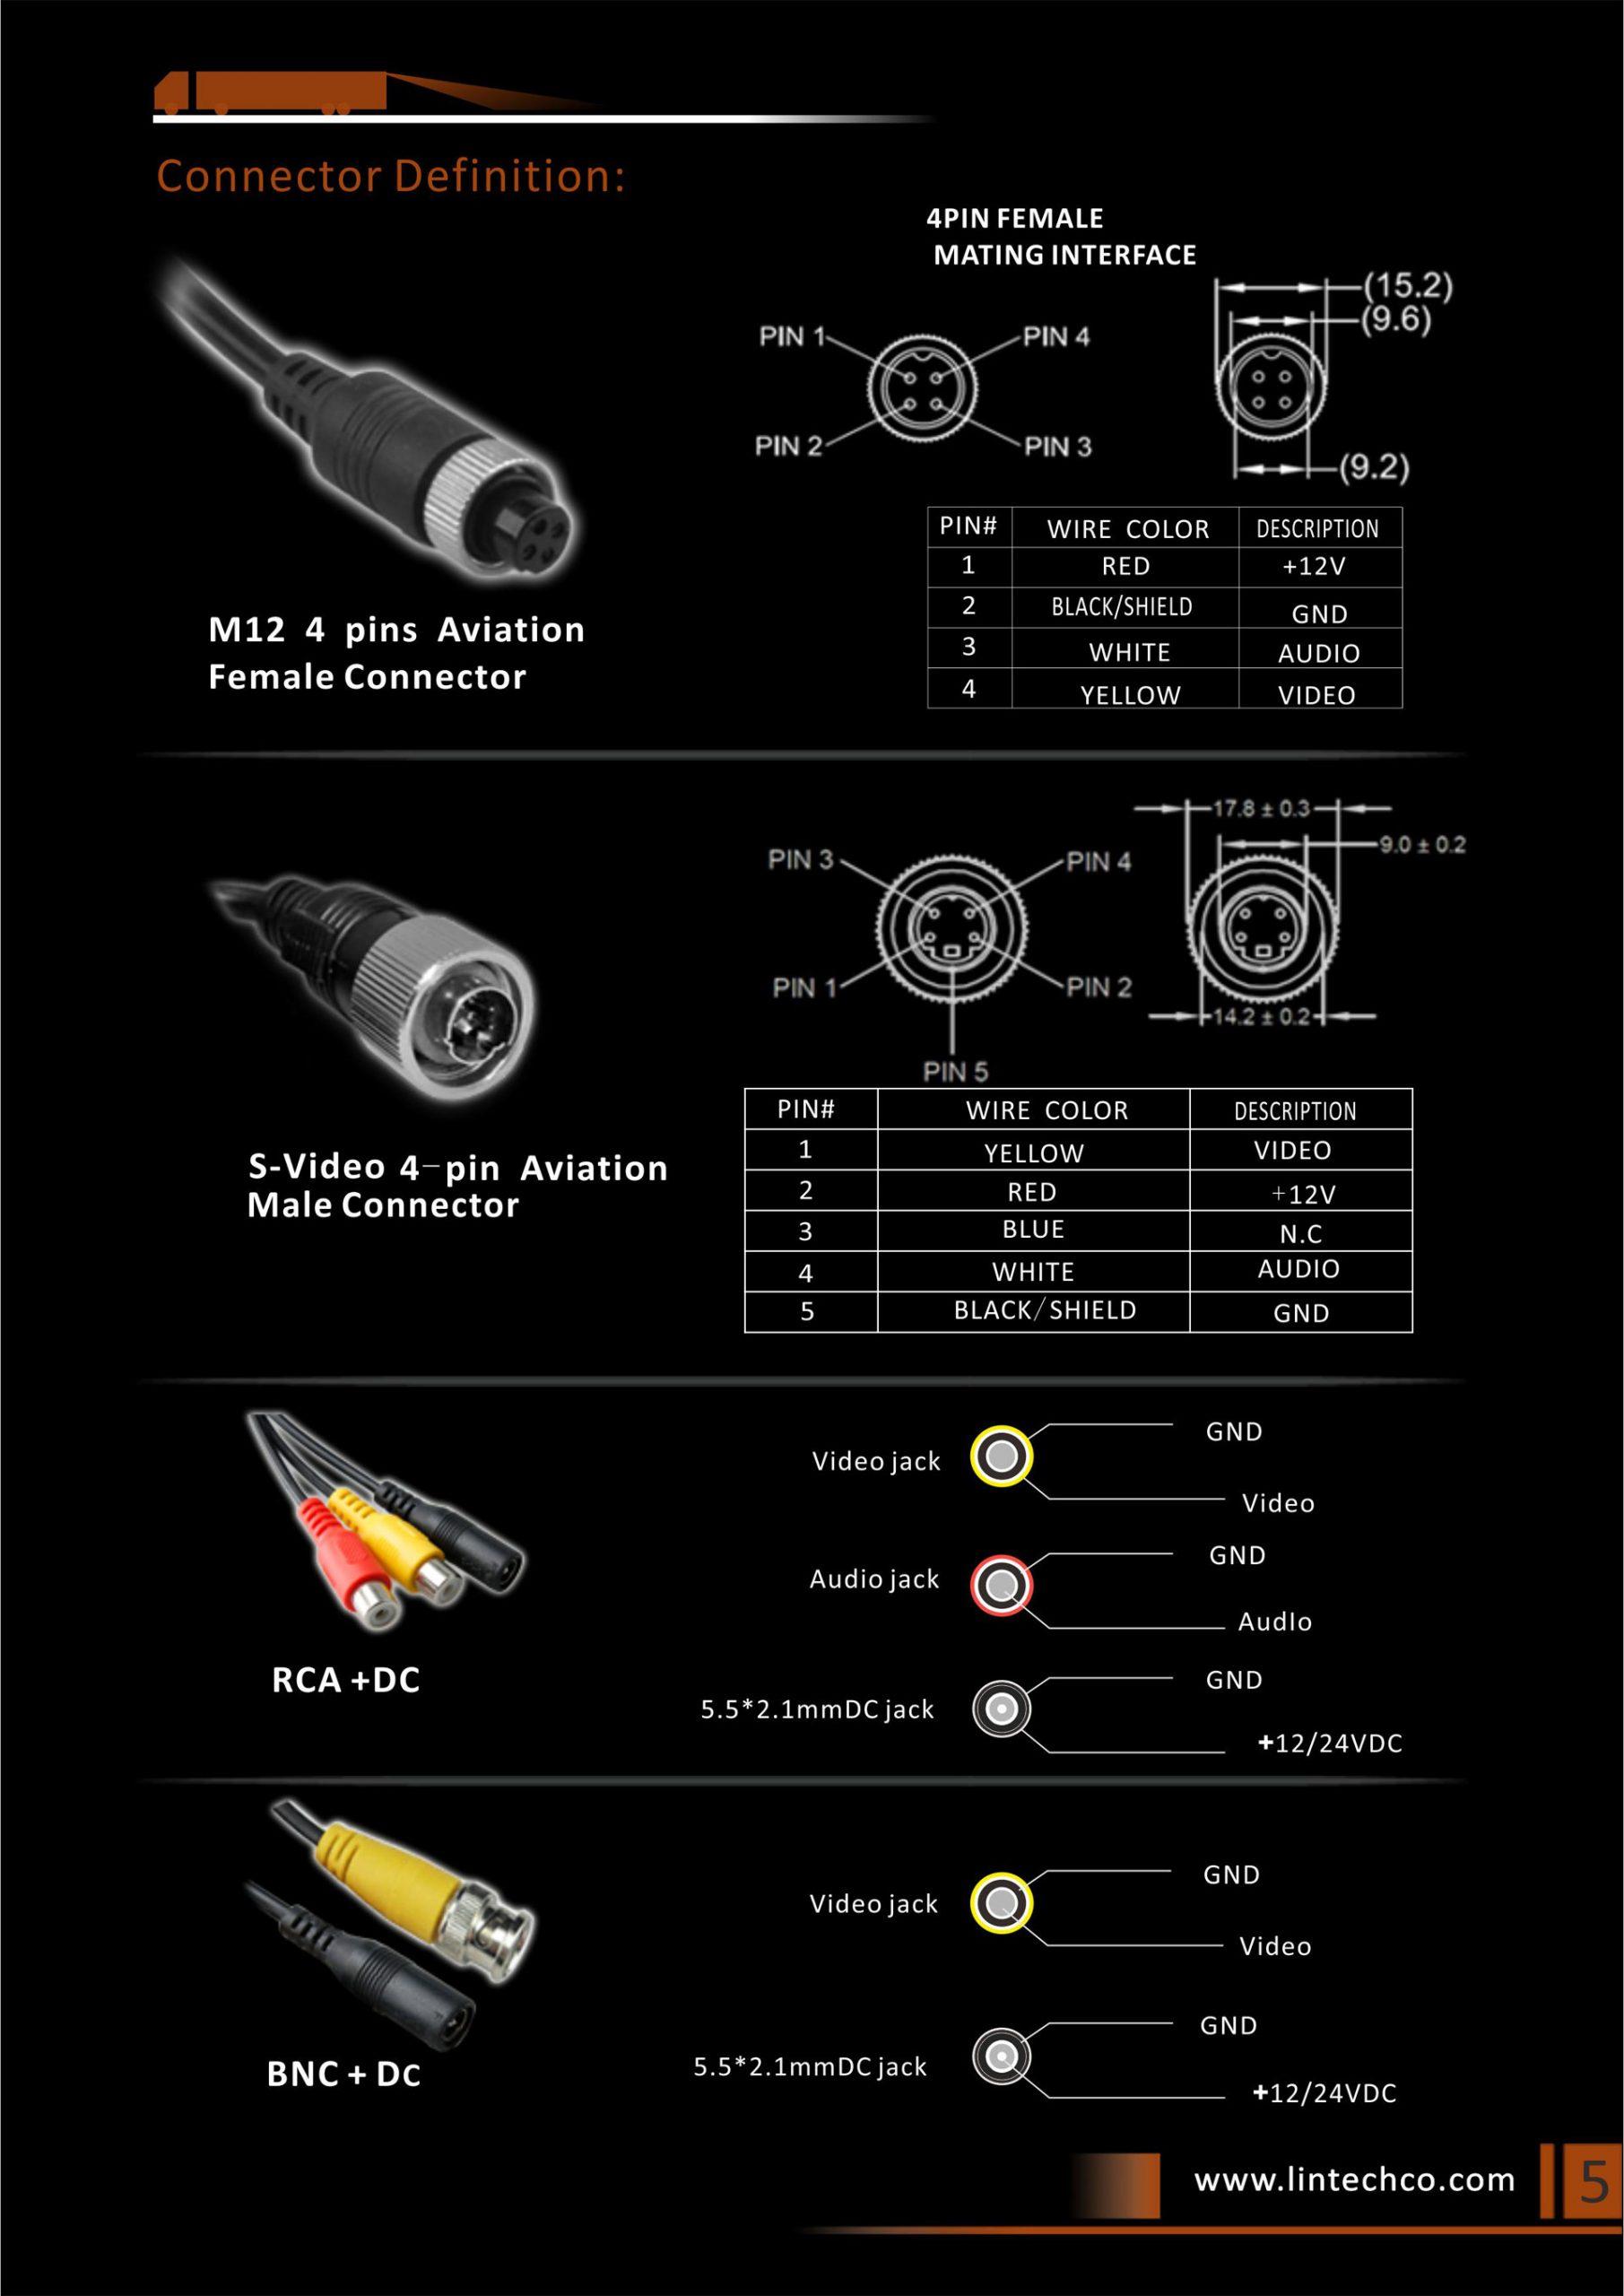 5.18pcs-IR-LED-Night-Vision-Waterproof-Rear-View-Camera